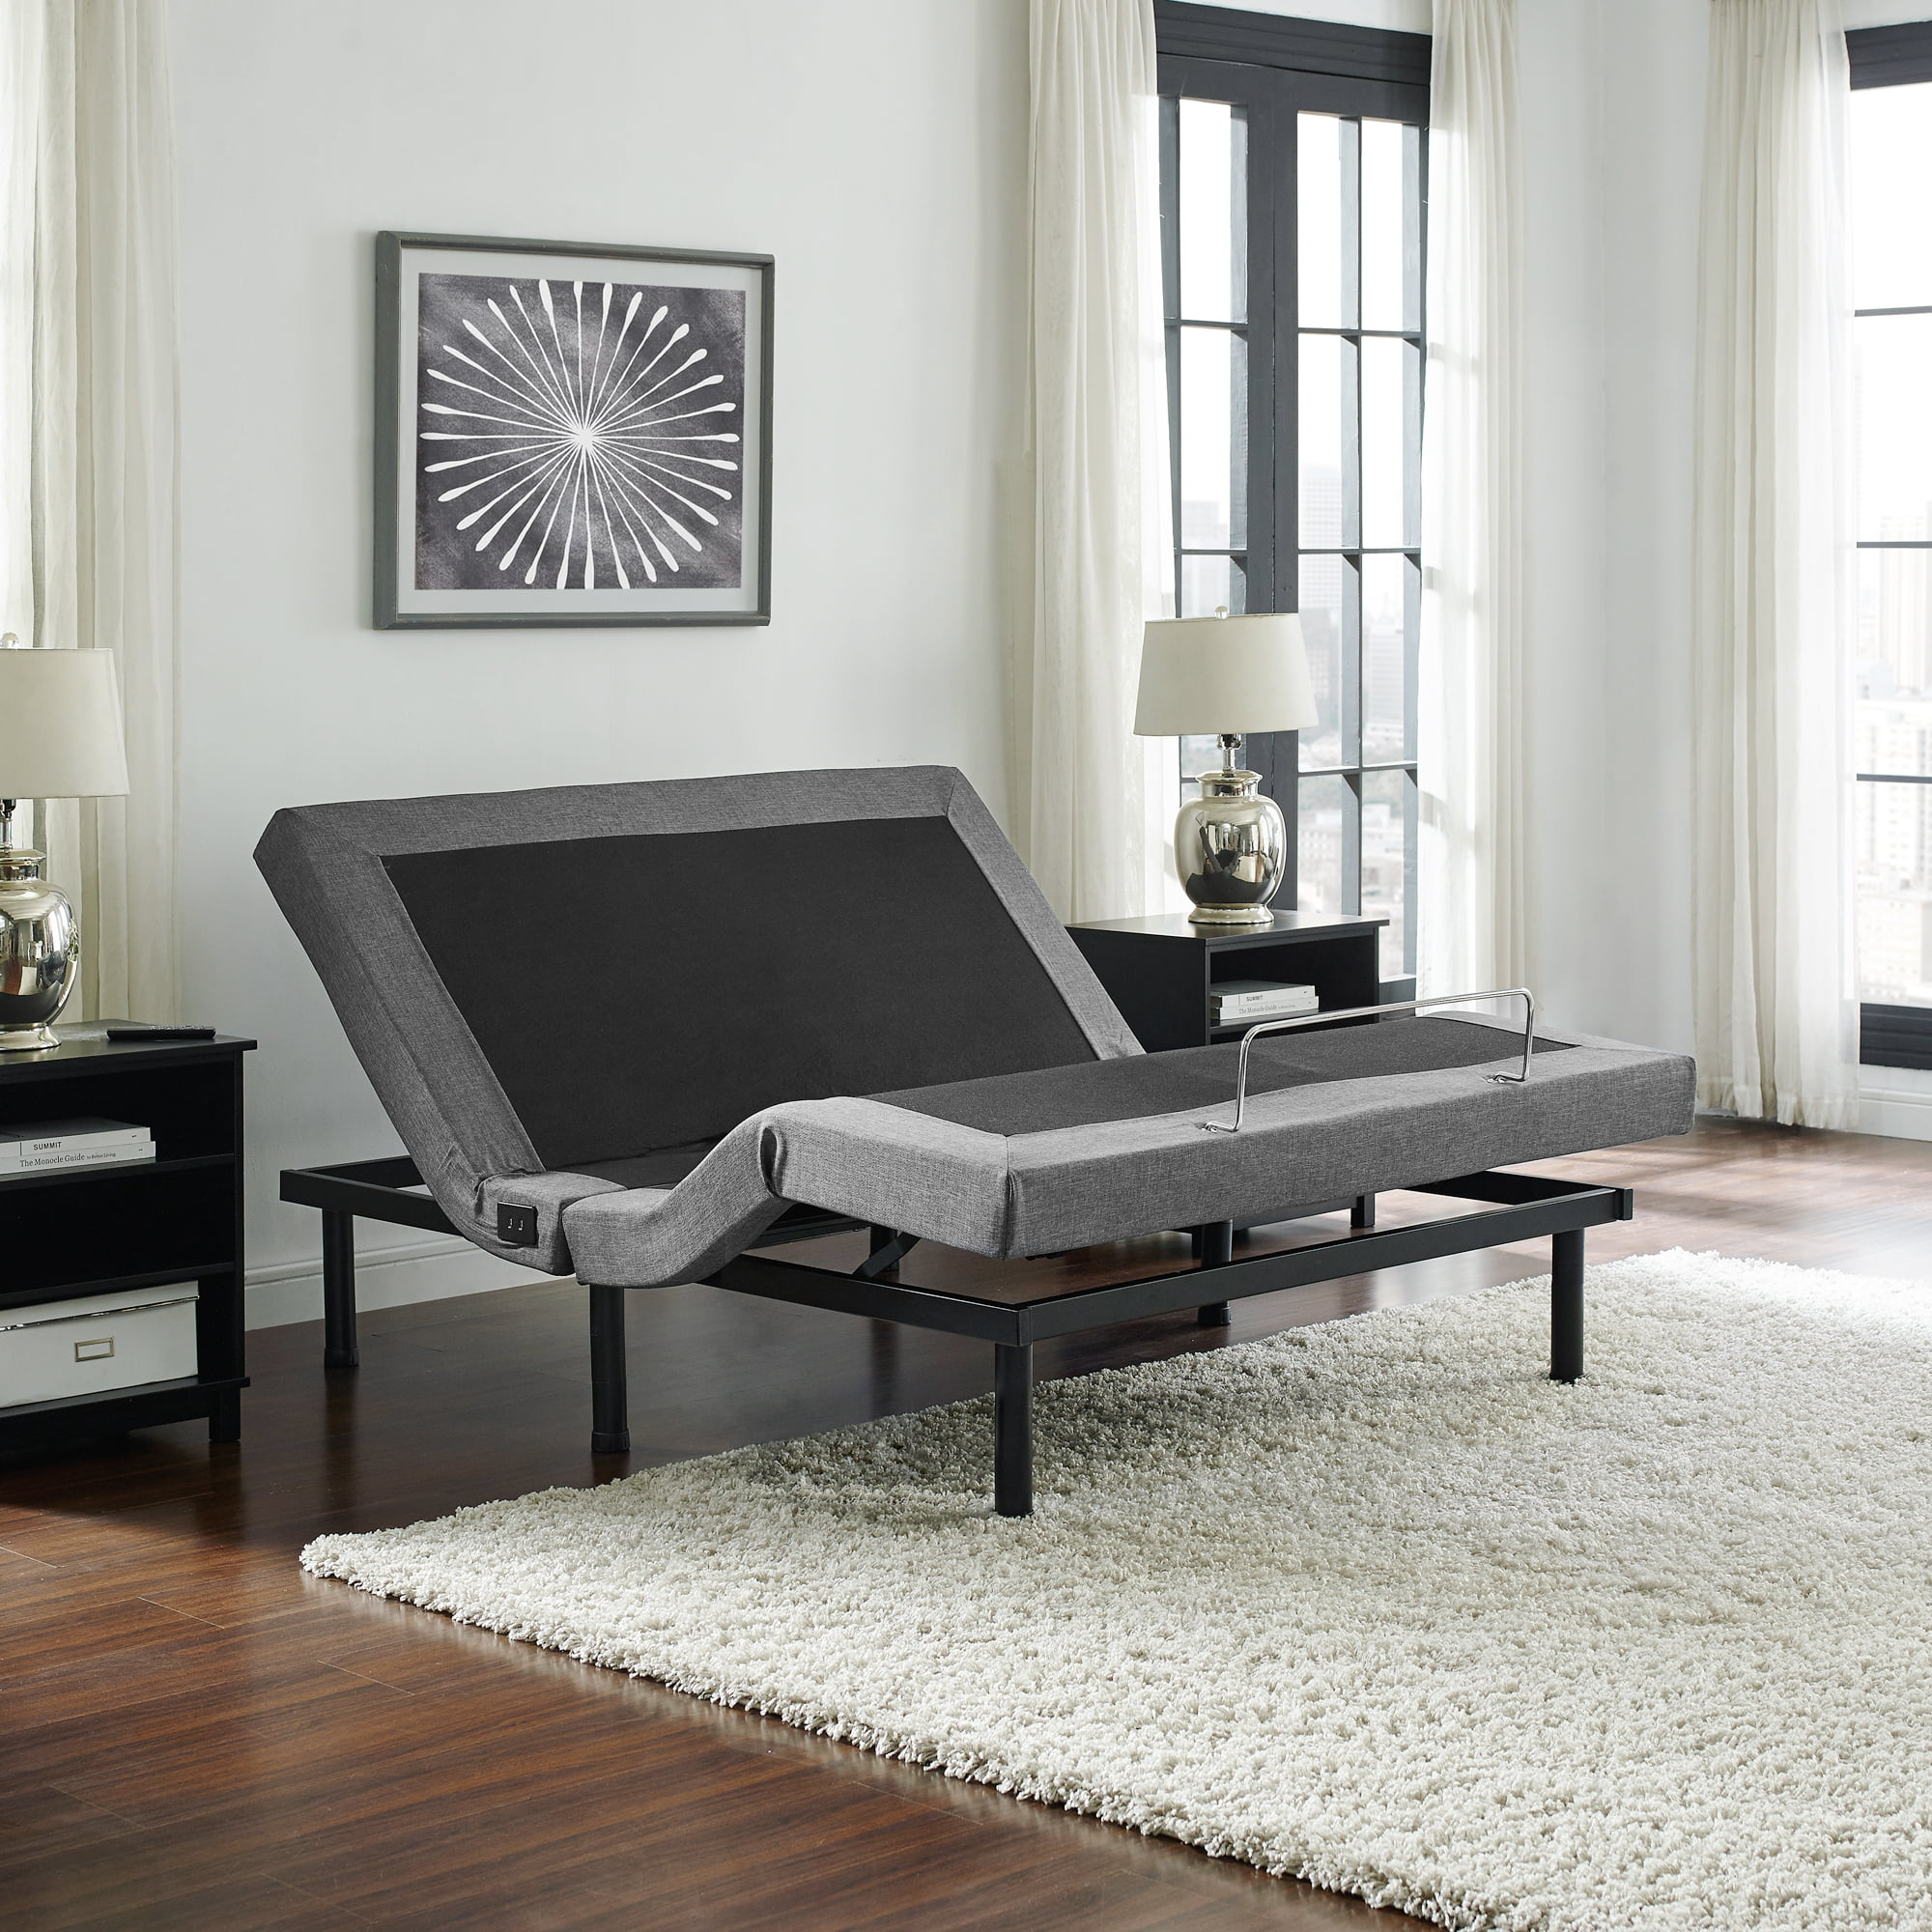 Posturecloud Adjustable Bed Base Dual Massage Usbs Three Leg Height Options And Wireless Remote Upholstered Ergonomic Bed Twin Xl Walmart Com Walmart Com